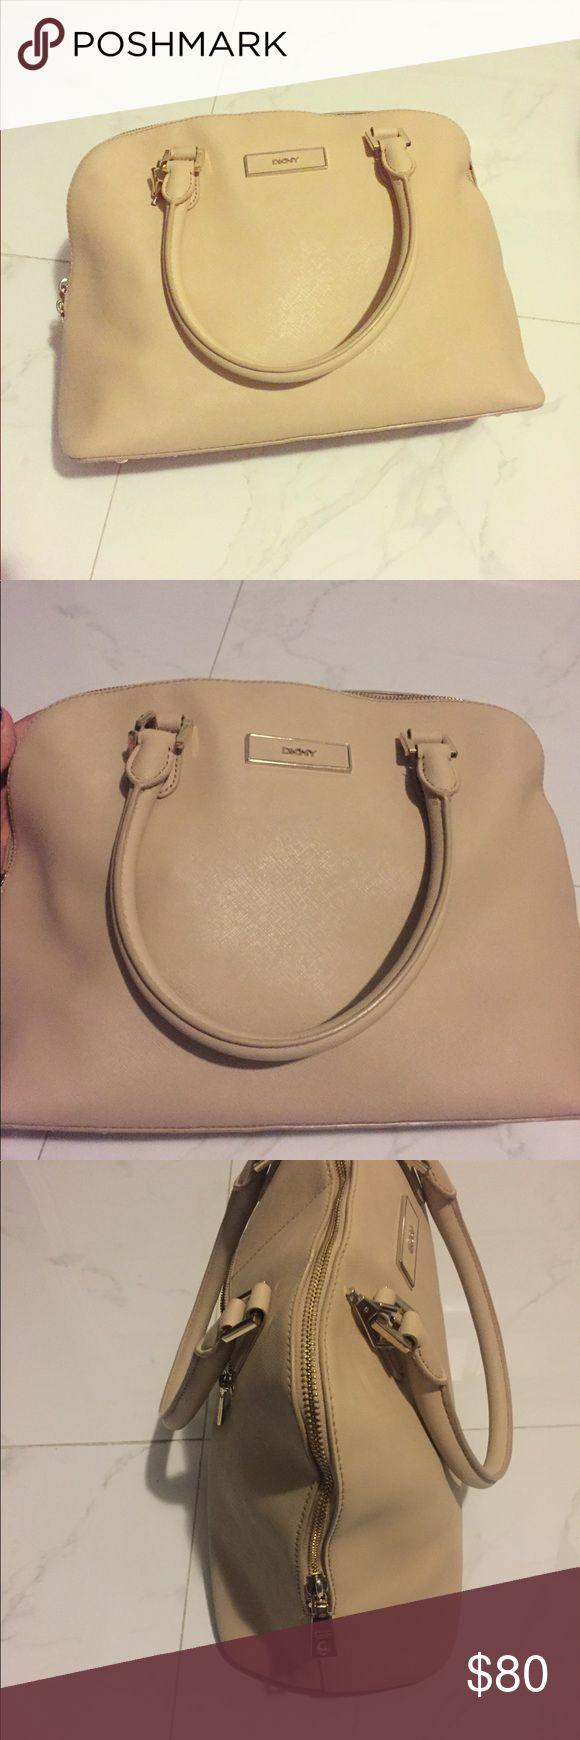 Tan DKNY Handbag Gorgeous tan DKNY handbag with top handle. Great condition! Dkny Bags